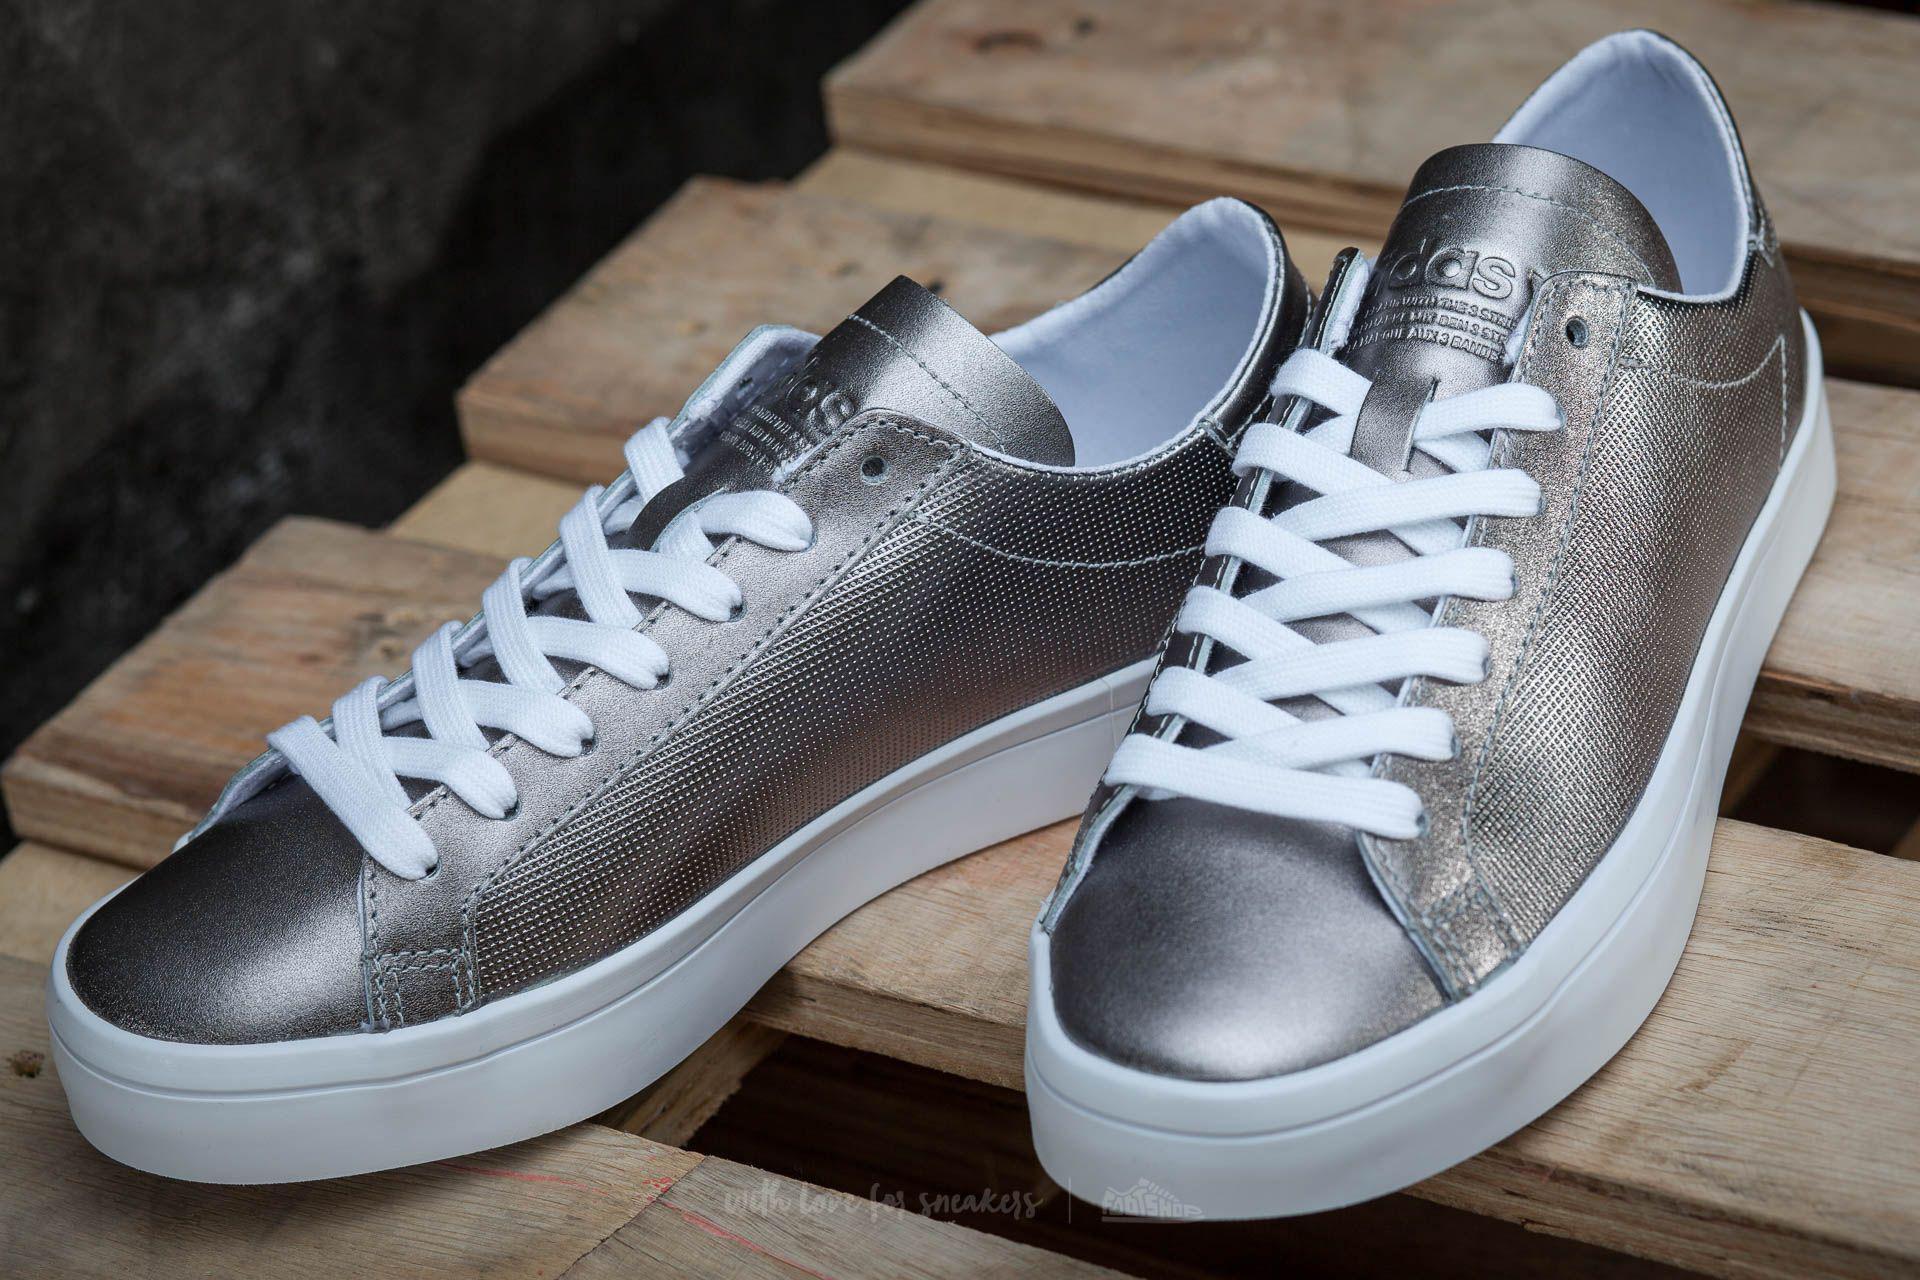 hot sale online 0770c b132a Lyst - adidas Originals Adidas Court Vantage W Night Metalli